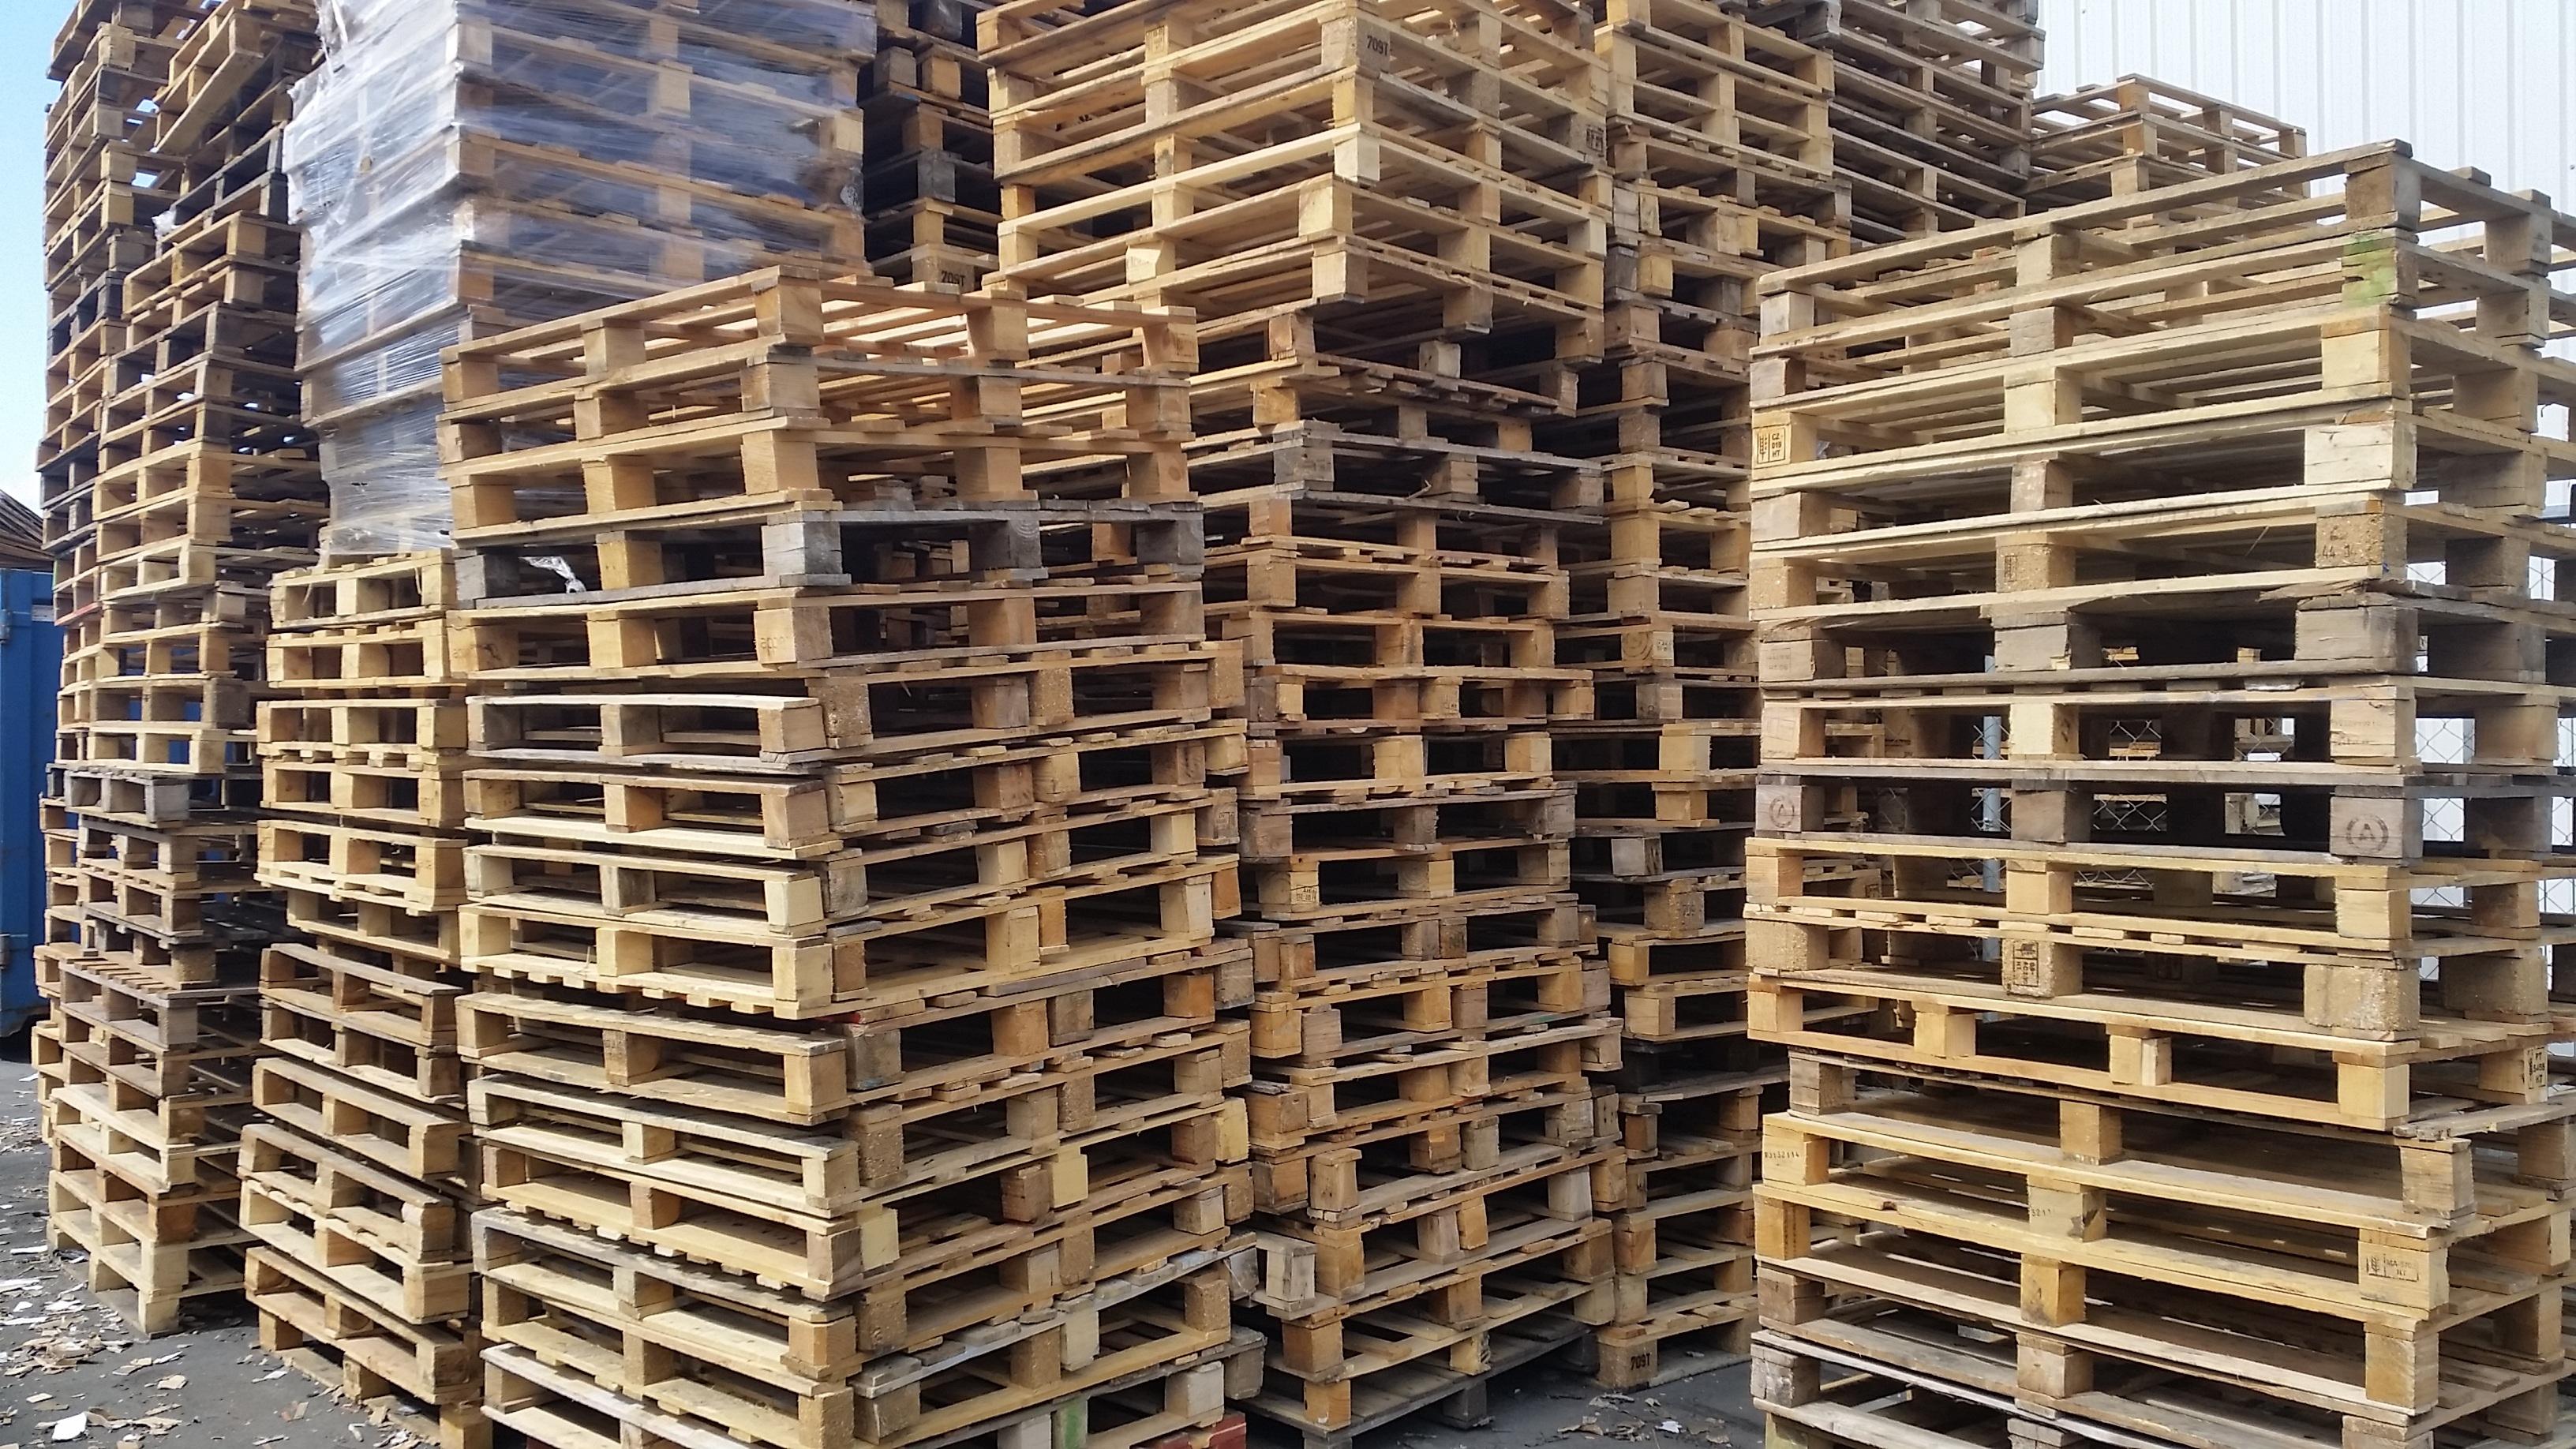 Structure Wood Beam Shop Industrial Brick Lumber Storage Woods Scaffolding  Pallet Manufactures Brickwork Logistics Logistic Man